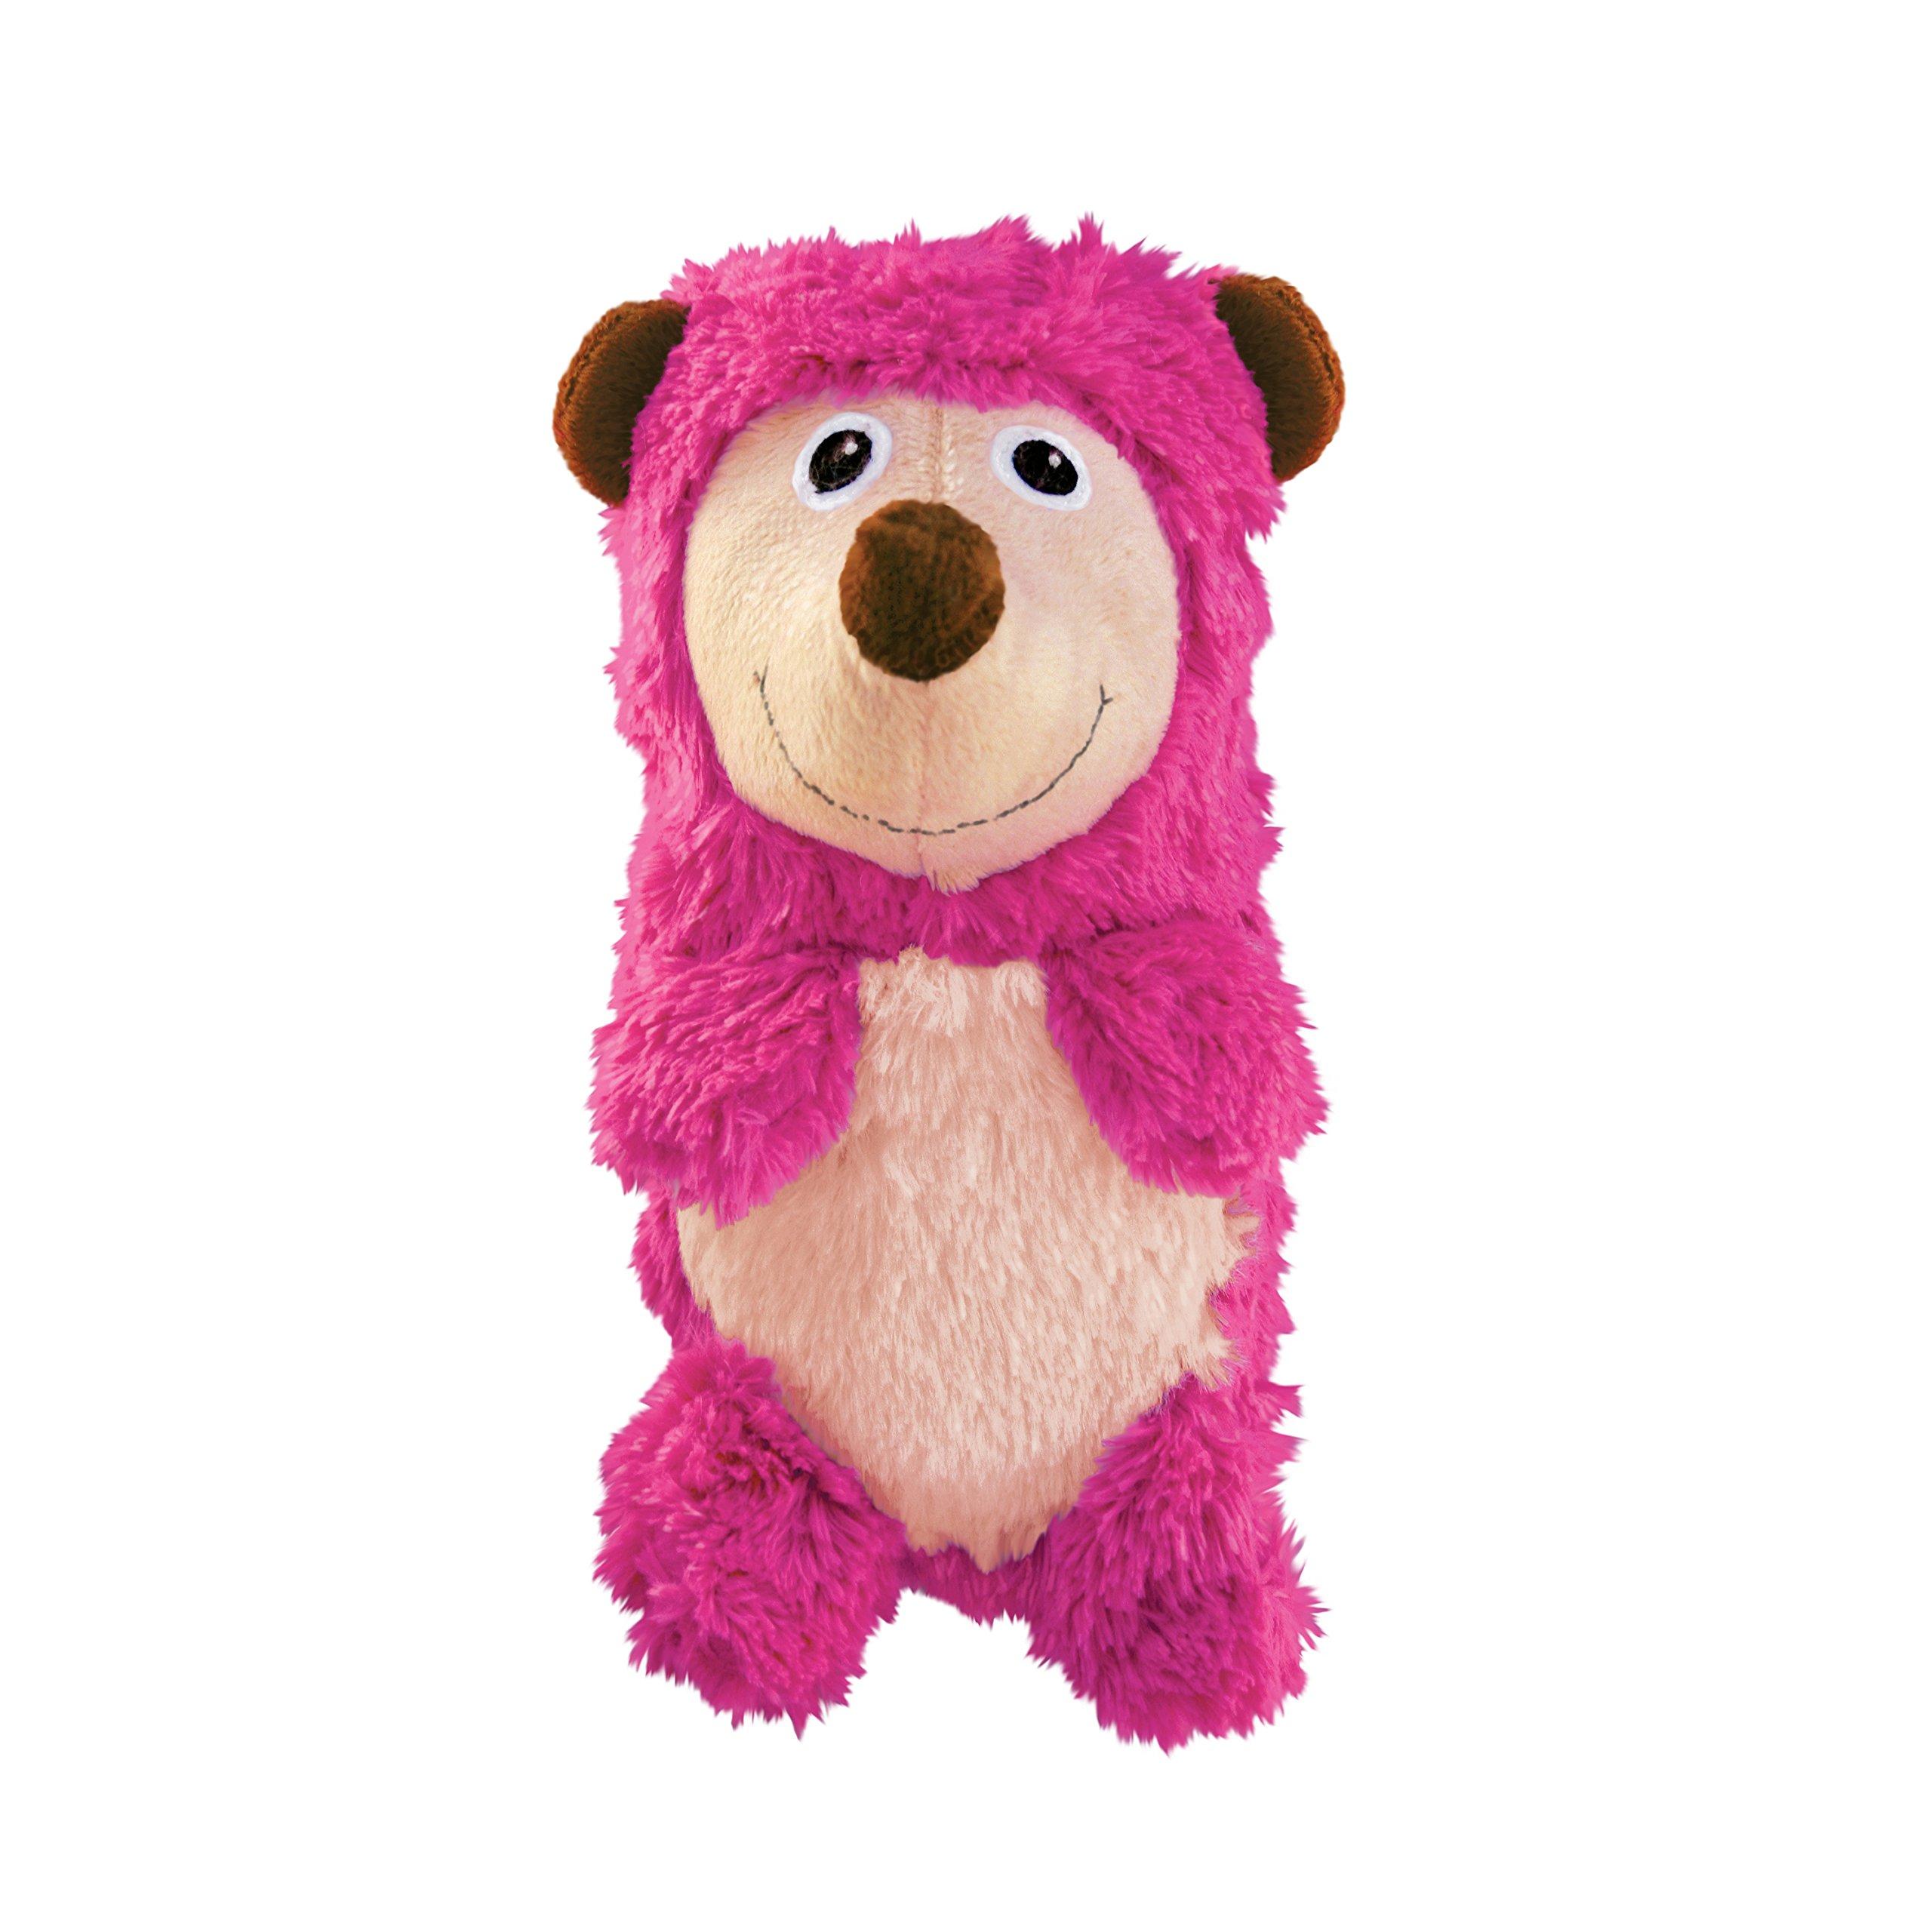 KONG Huggz Hedgehog Pet Toy, Small by KONG